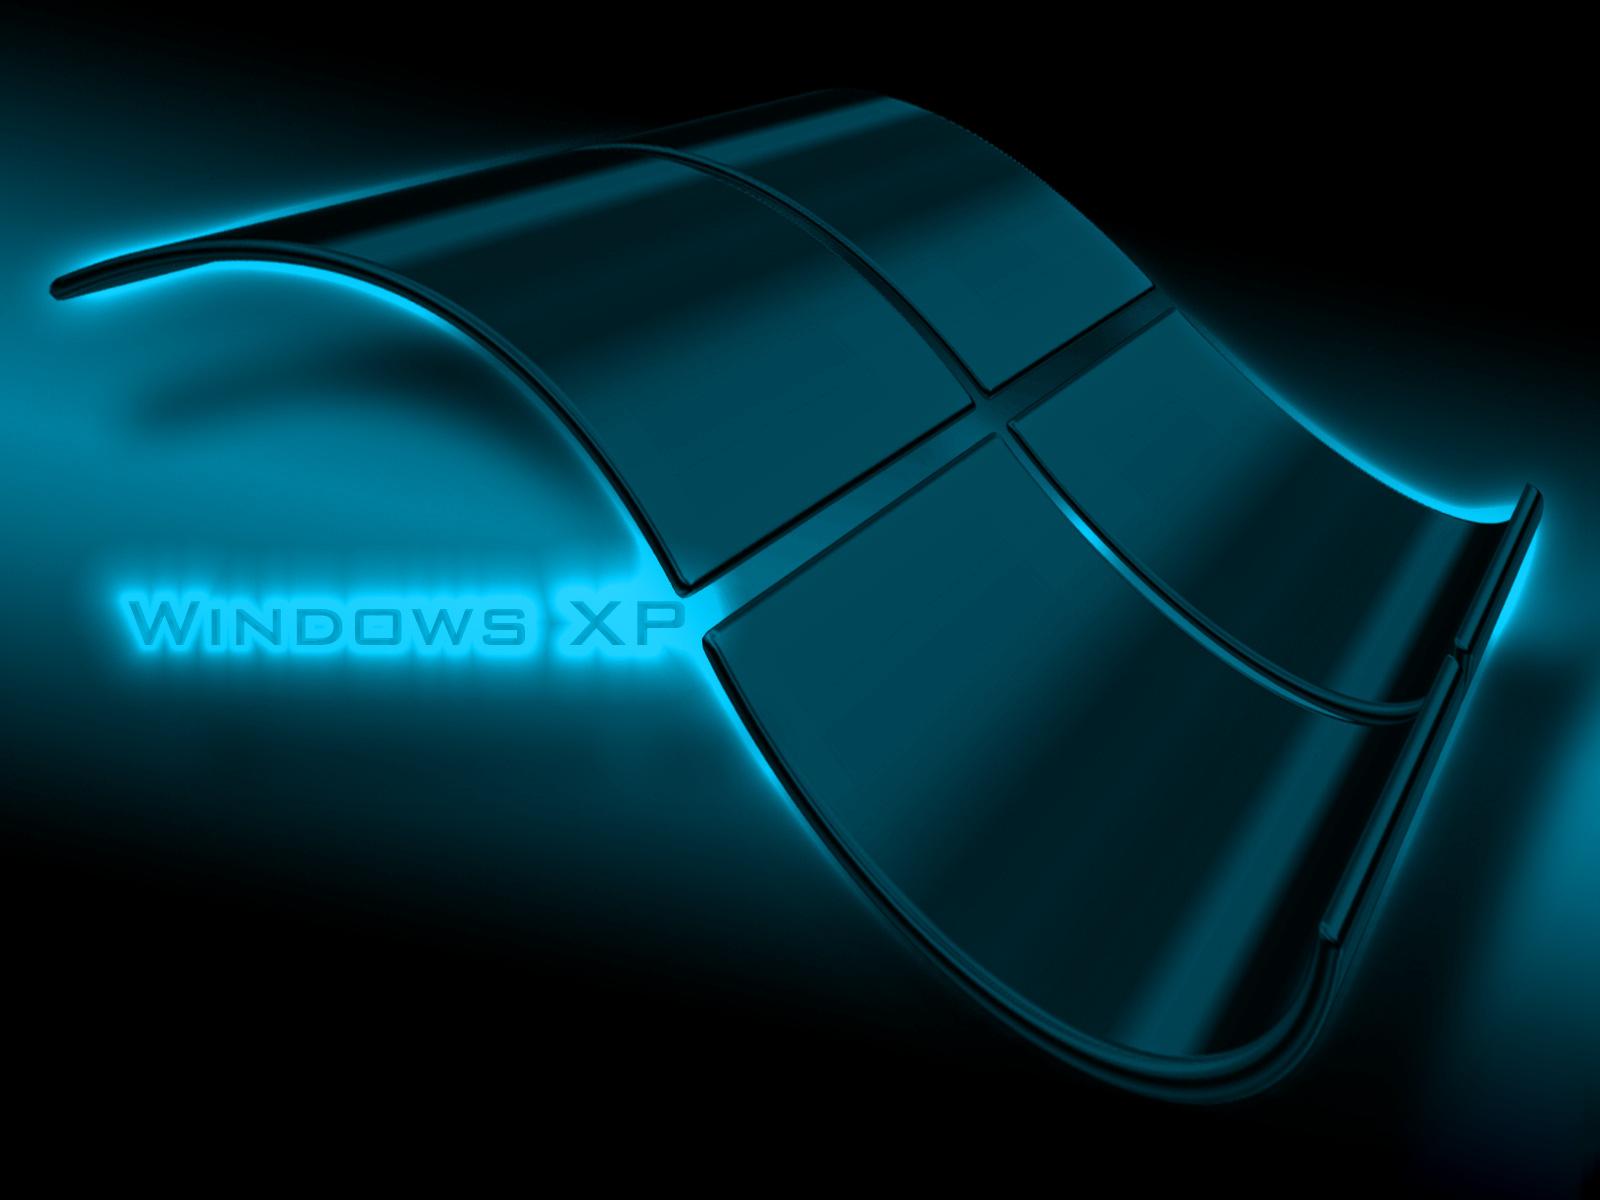 http://4.bp.blogspot.com/-Okqiukw8mBU/UD5INjbrN4I/AAAAAAAABPA/_FygFG3d-2M/s1600/3d-windows-wallpapers.jpg